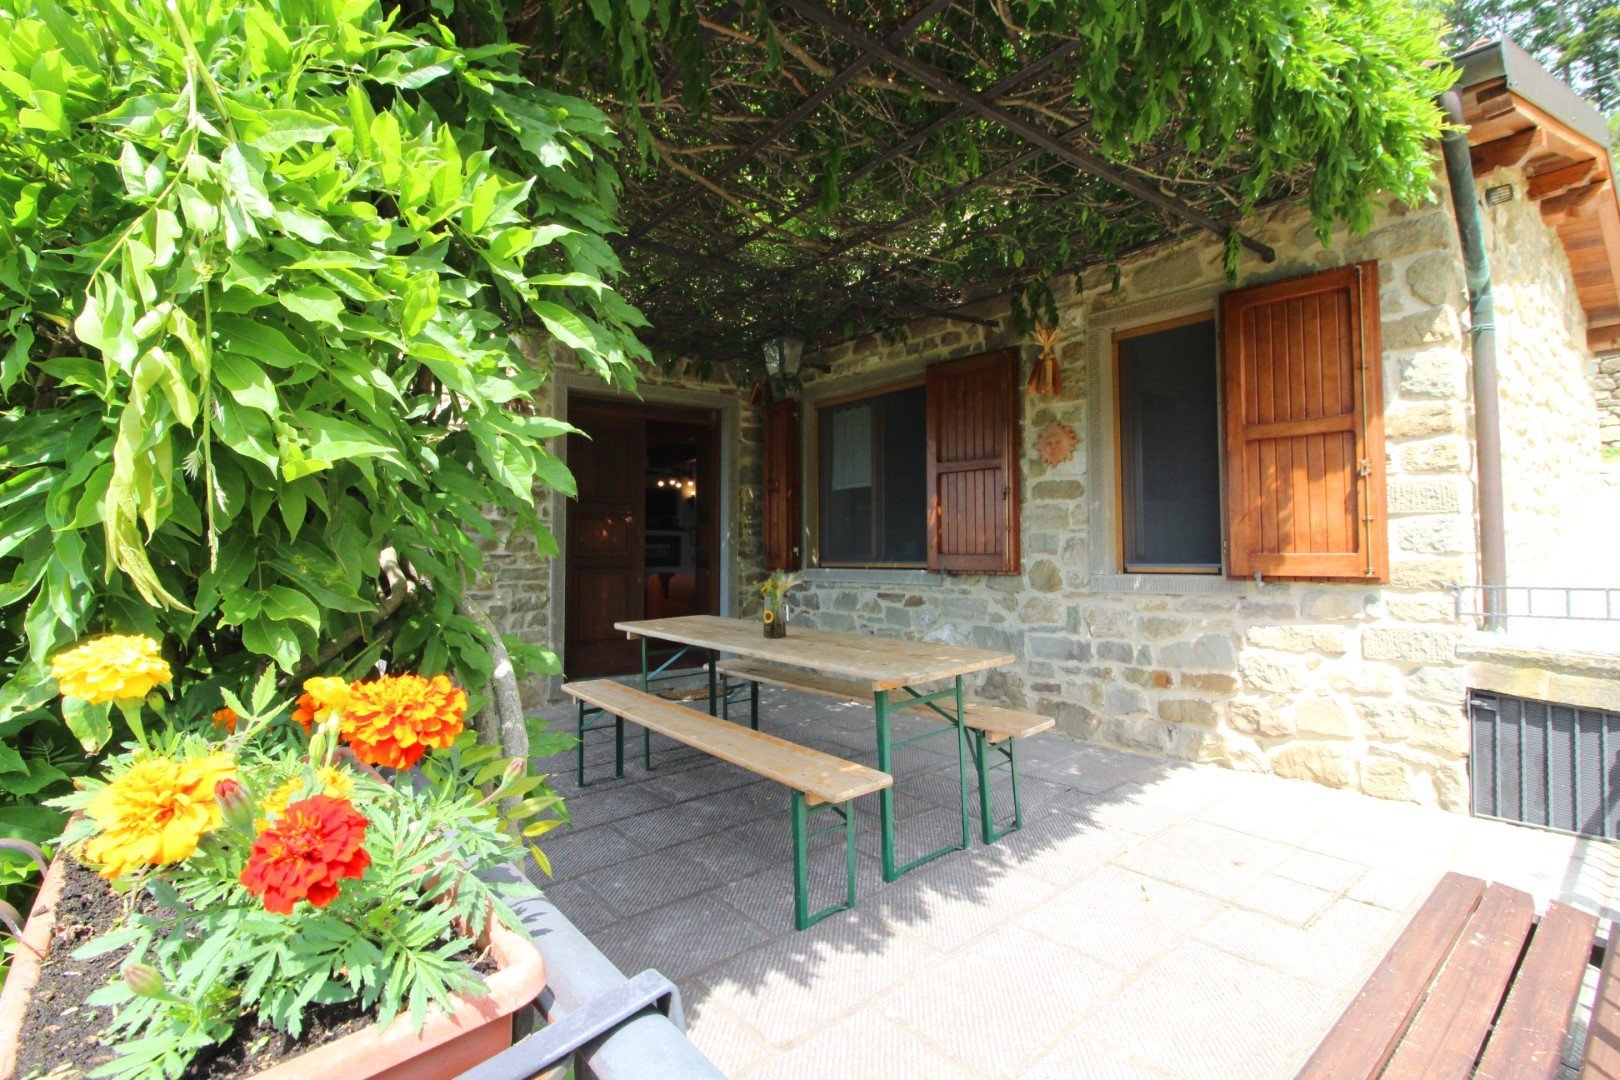 Santa Cristina - overdekt terras met picknicktafel